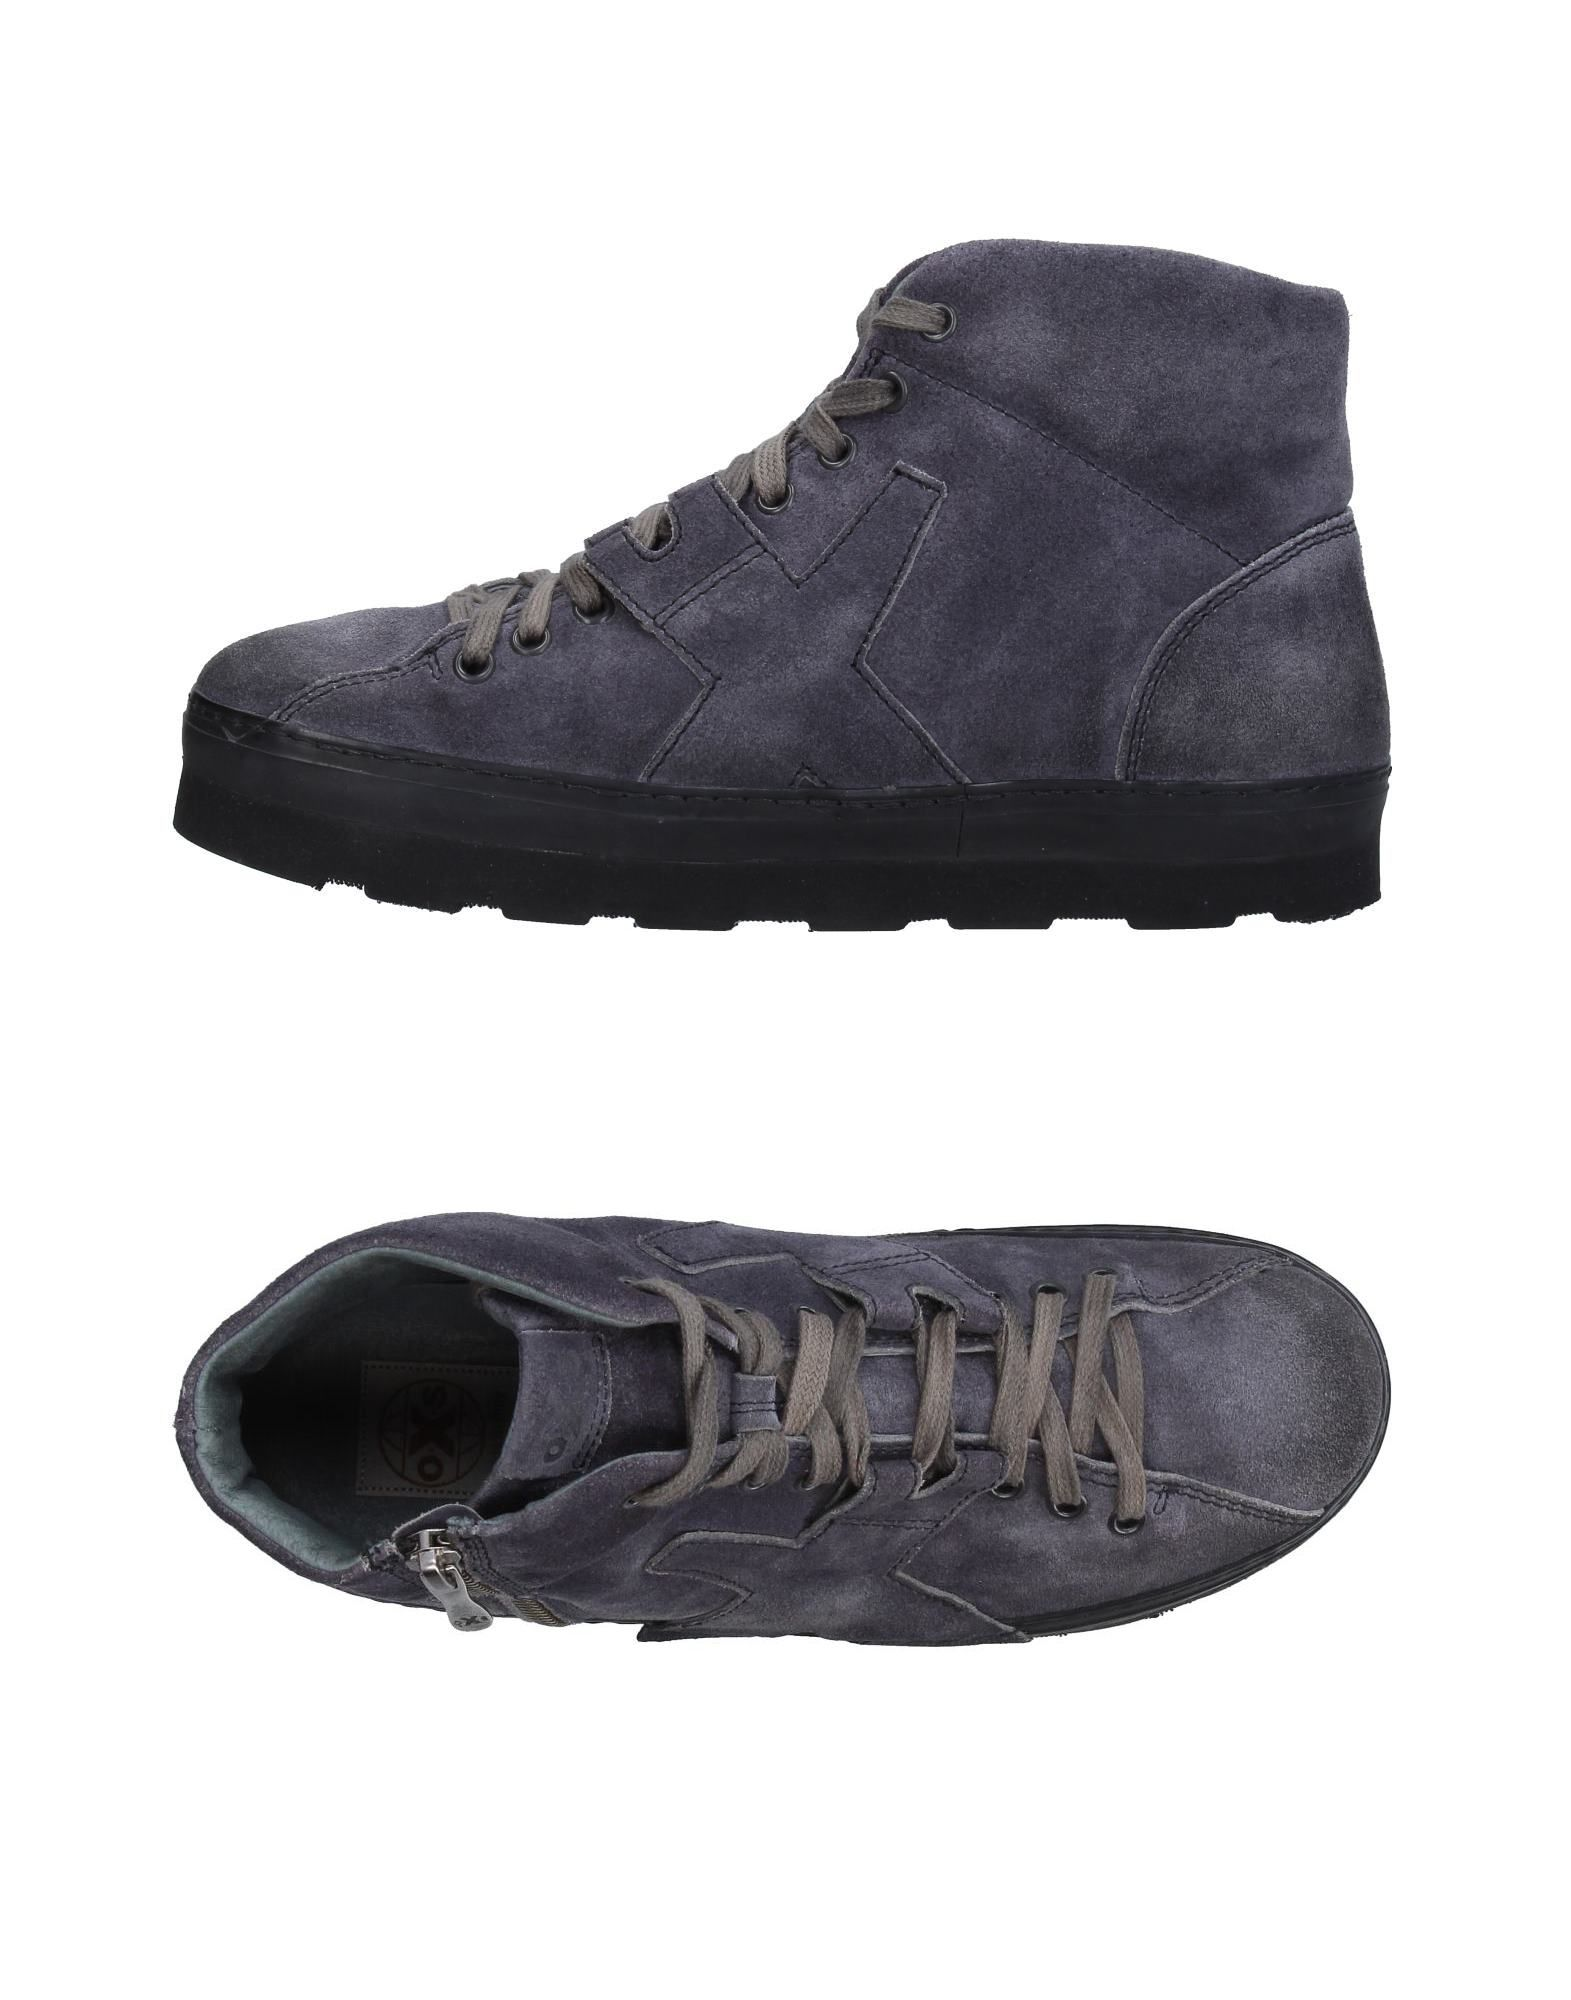 O.X.S. Высокие кеды и кроссовки кеды кроссовки высокие dc council mid tx stone camo